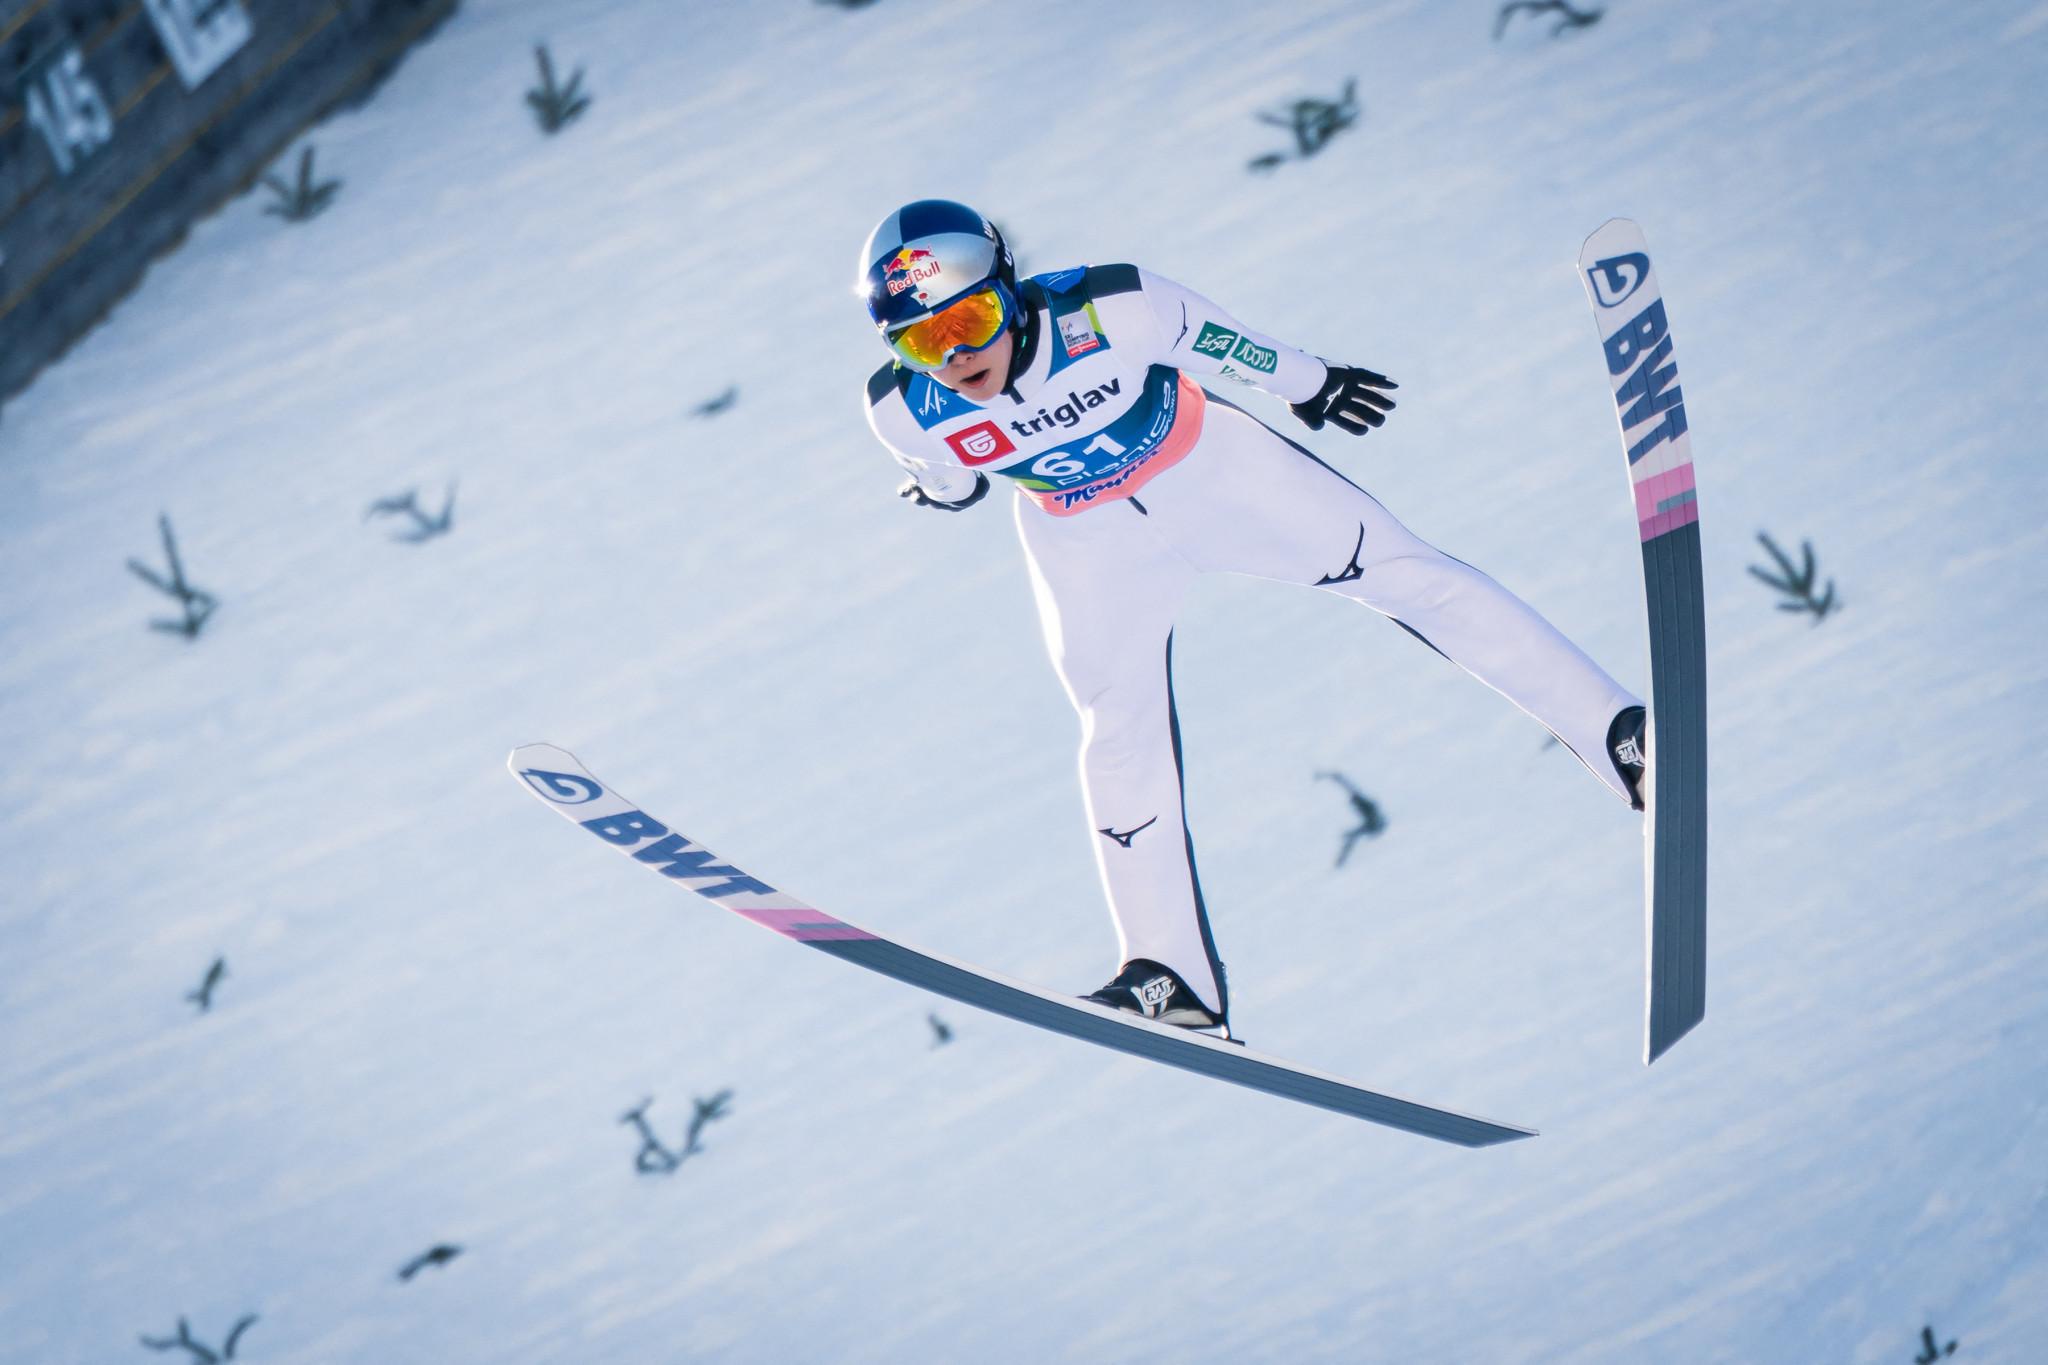 Another Ski Jumping World Cup win for Kobayashi overshadowed by nasty Tande crash